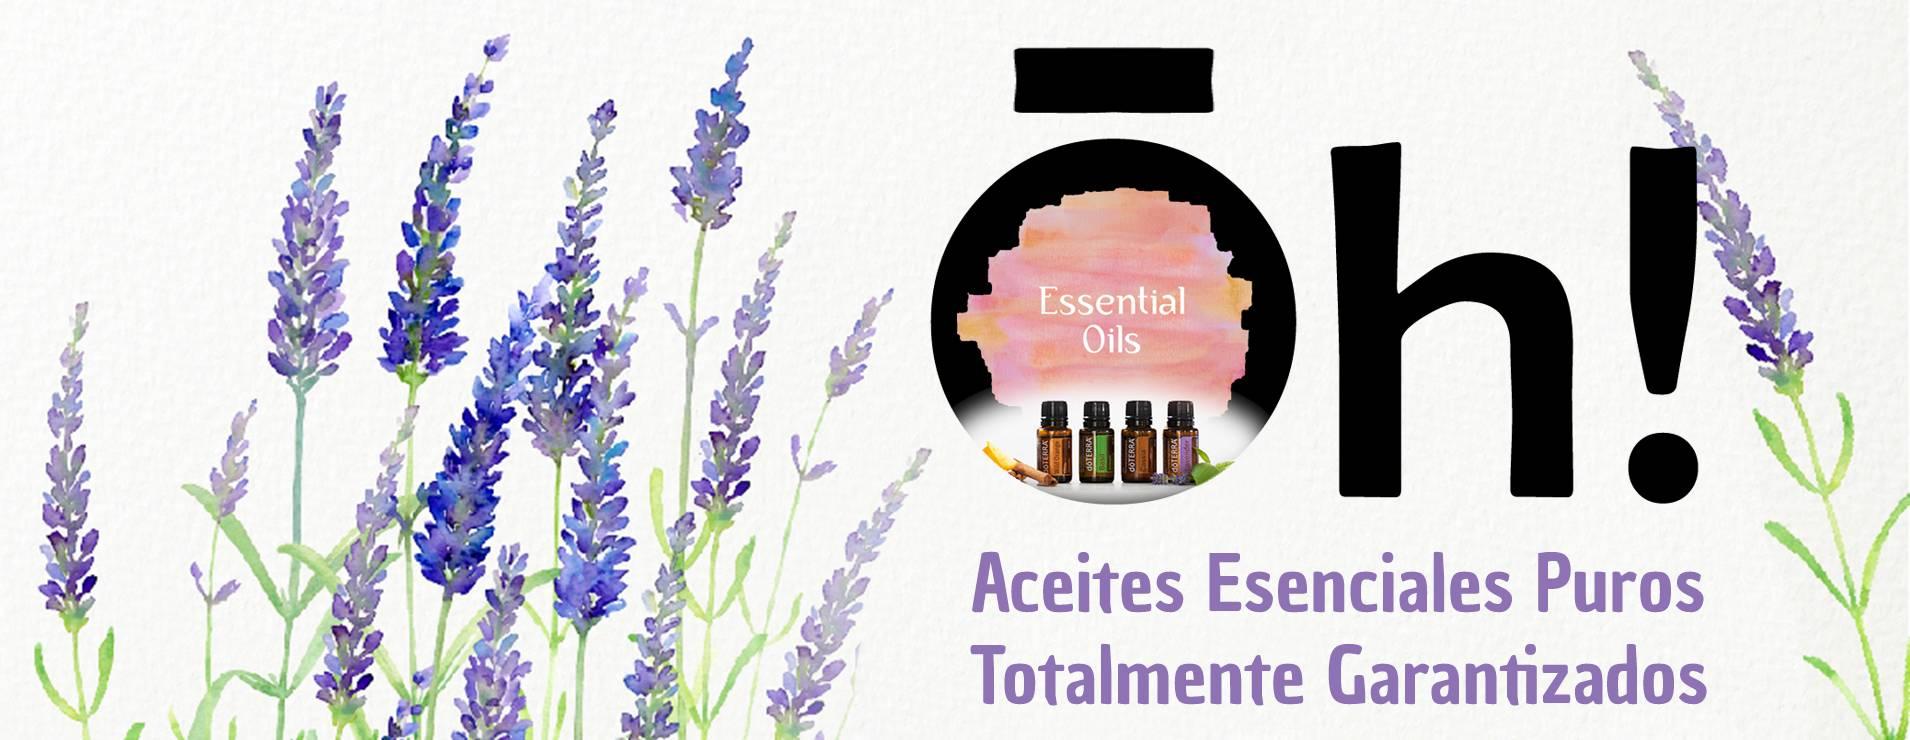 OH Aceites Esenciales Puros Totalmente Garantizados